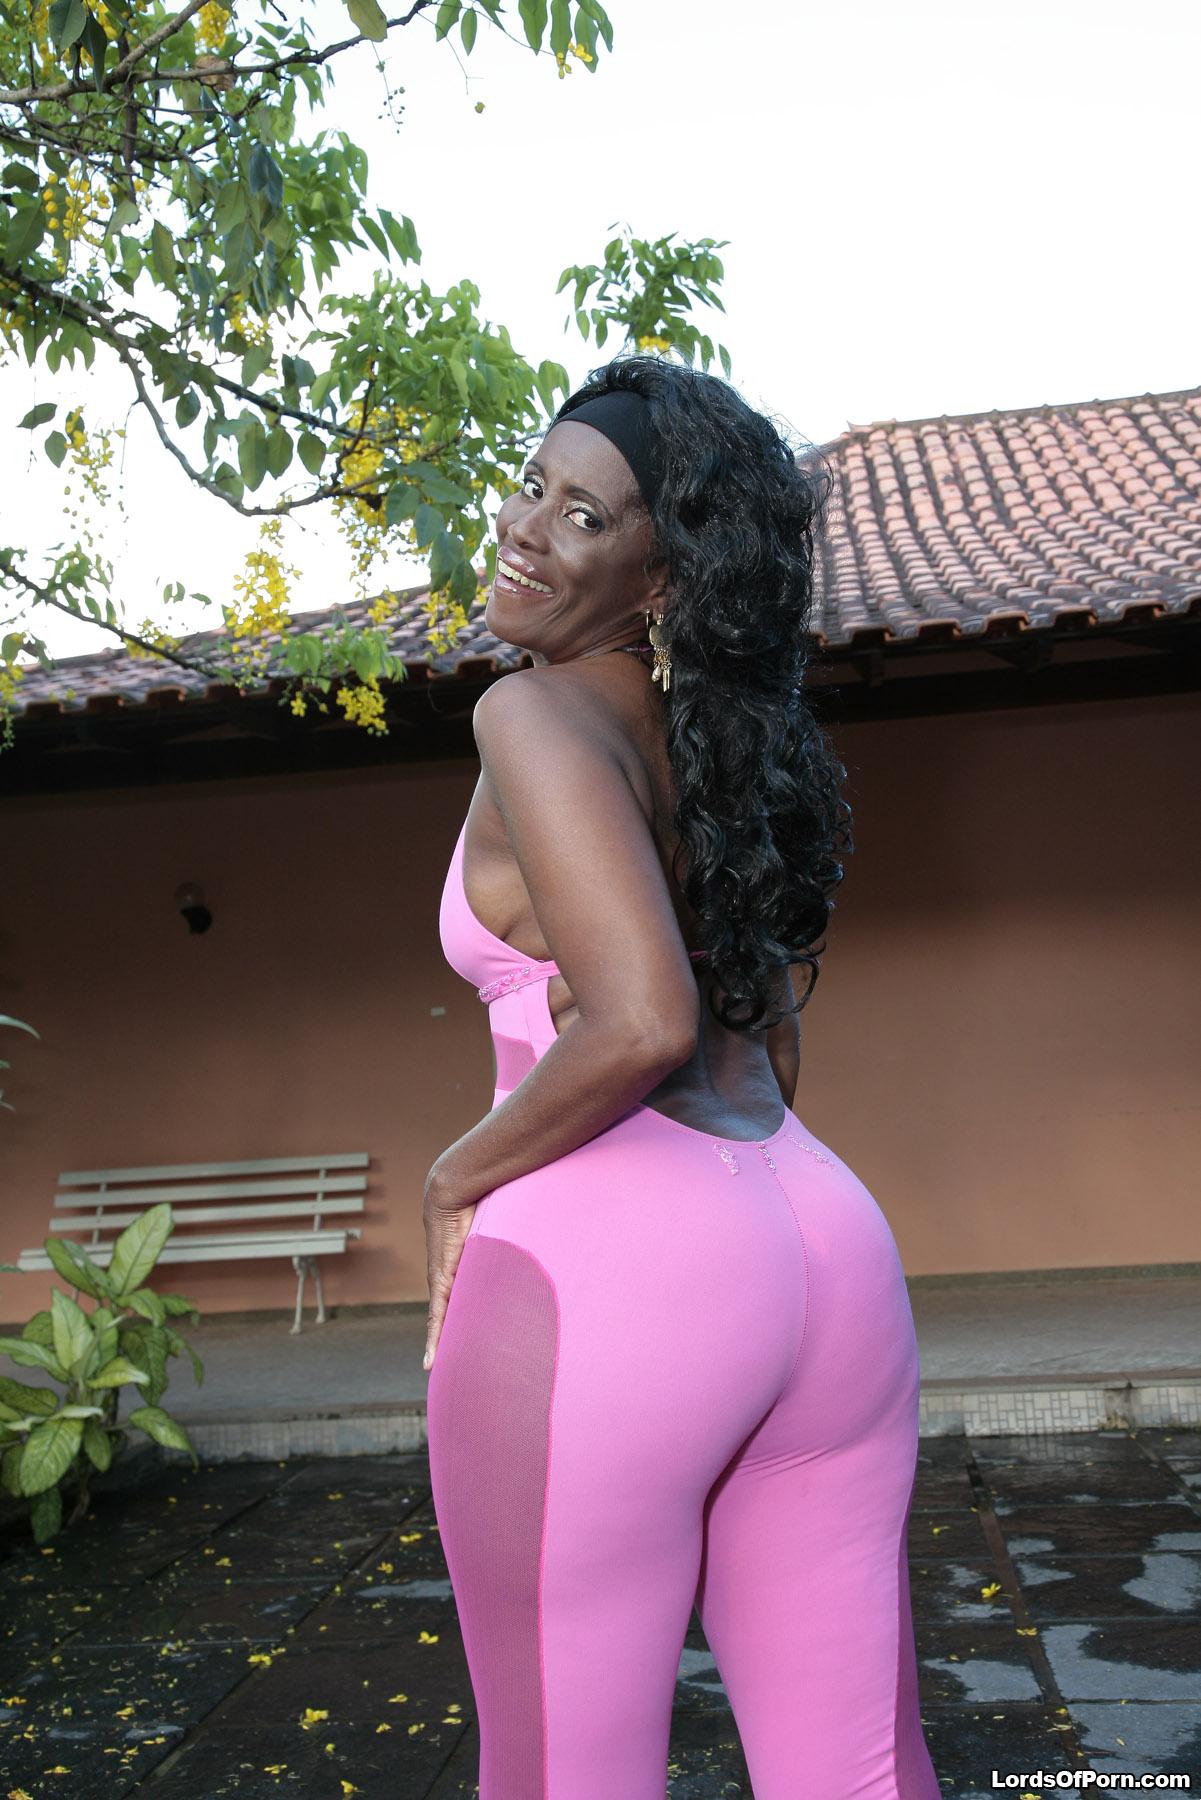 Nubia brazilian milf consider, that you